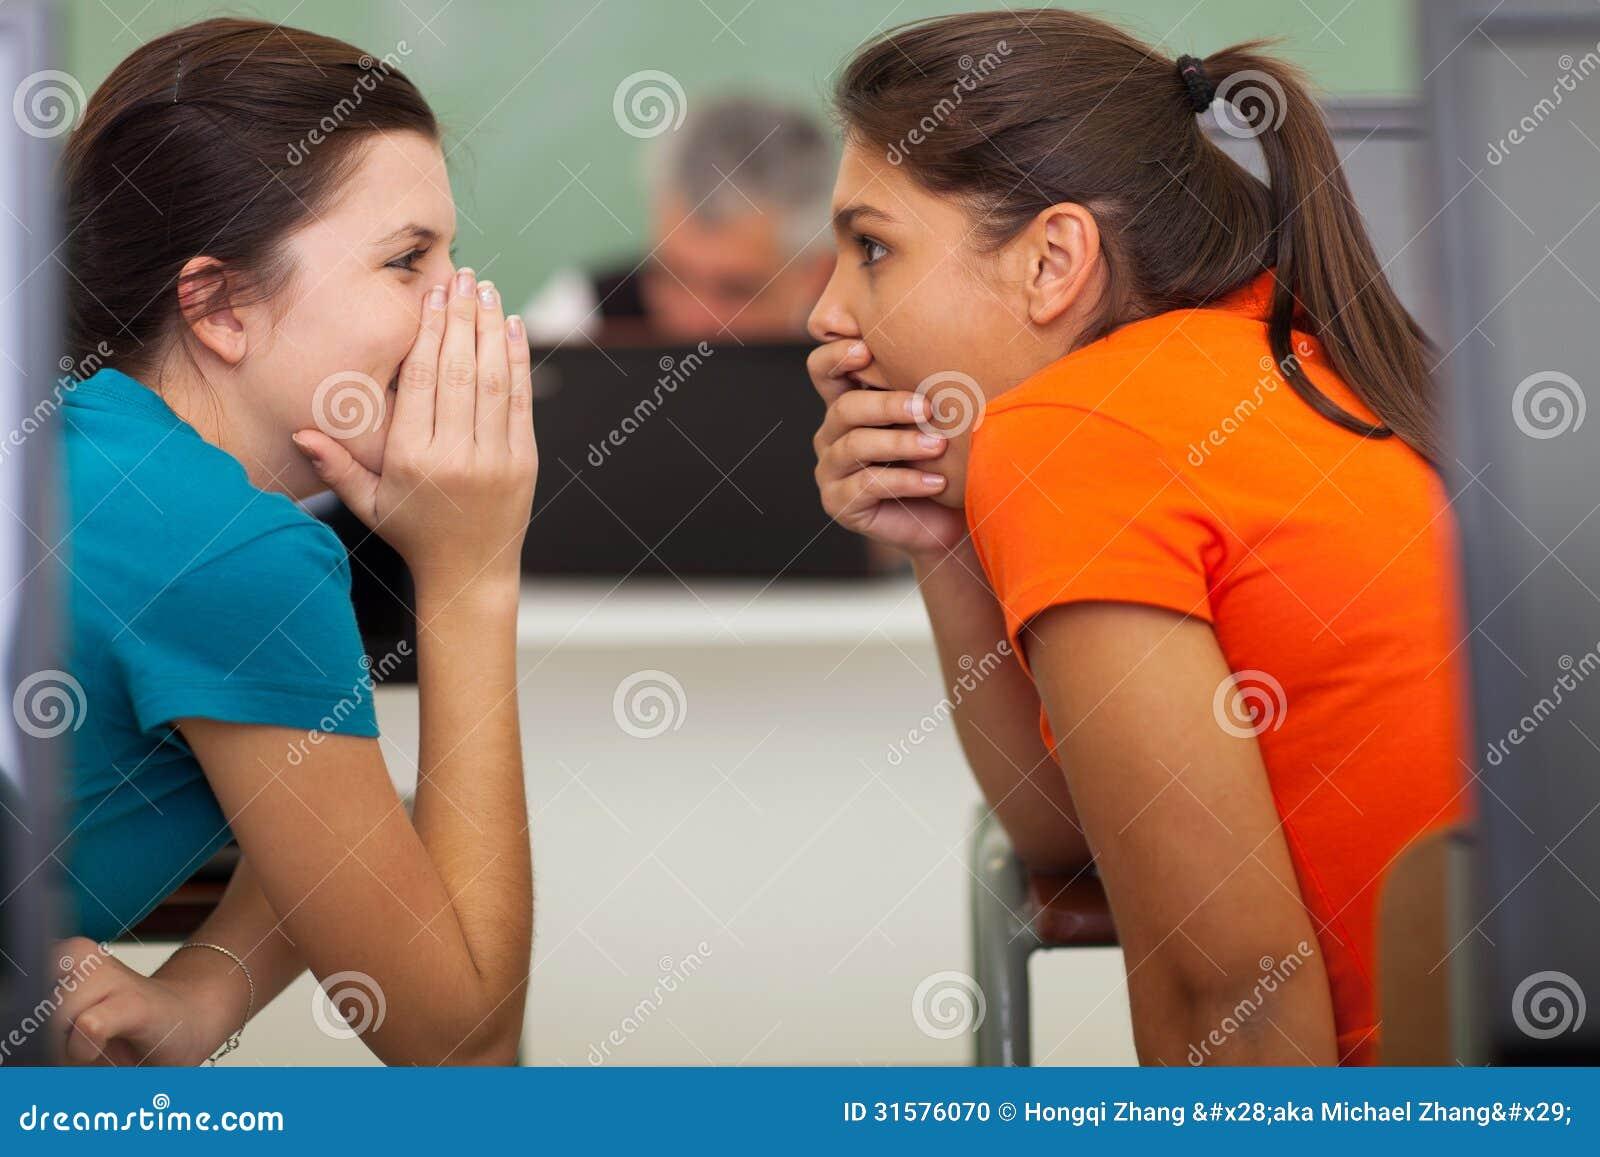 Modern Computer Classroom ~ School students gossiping stock photo image